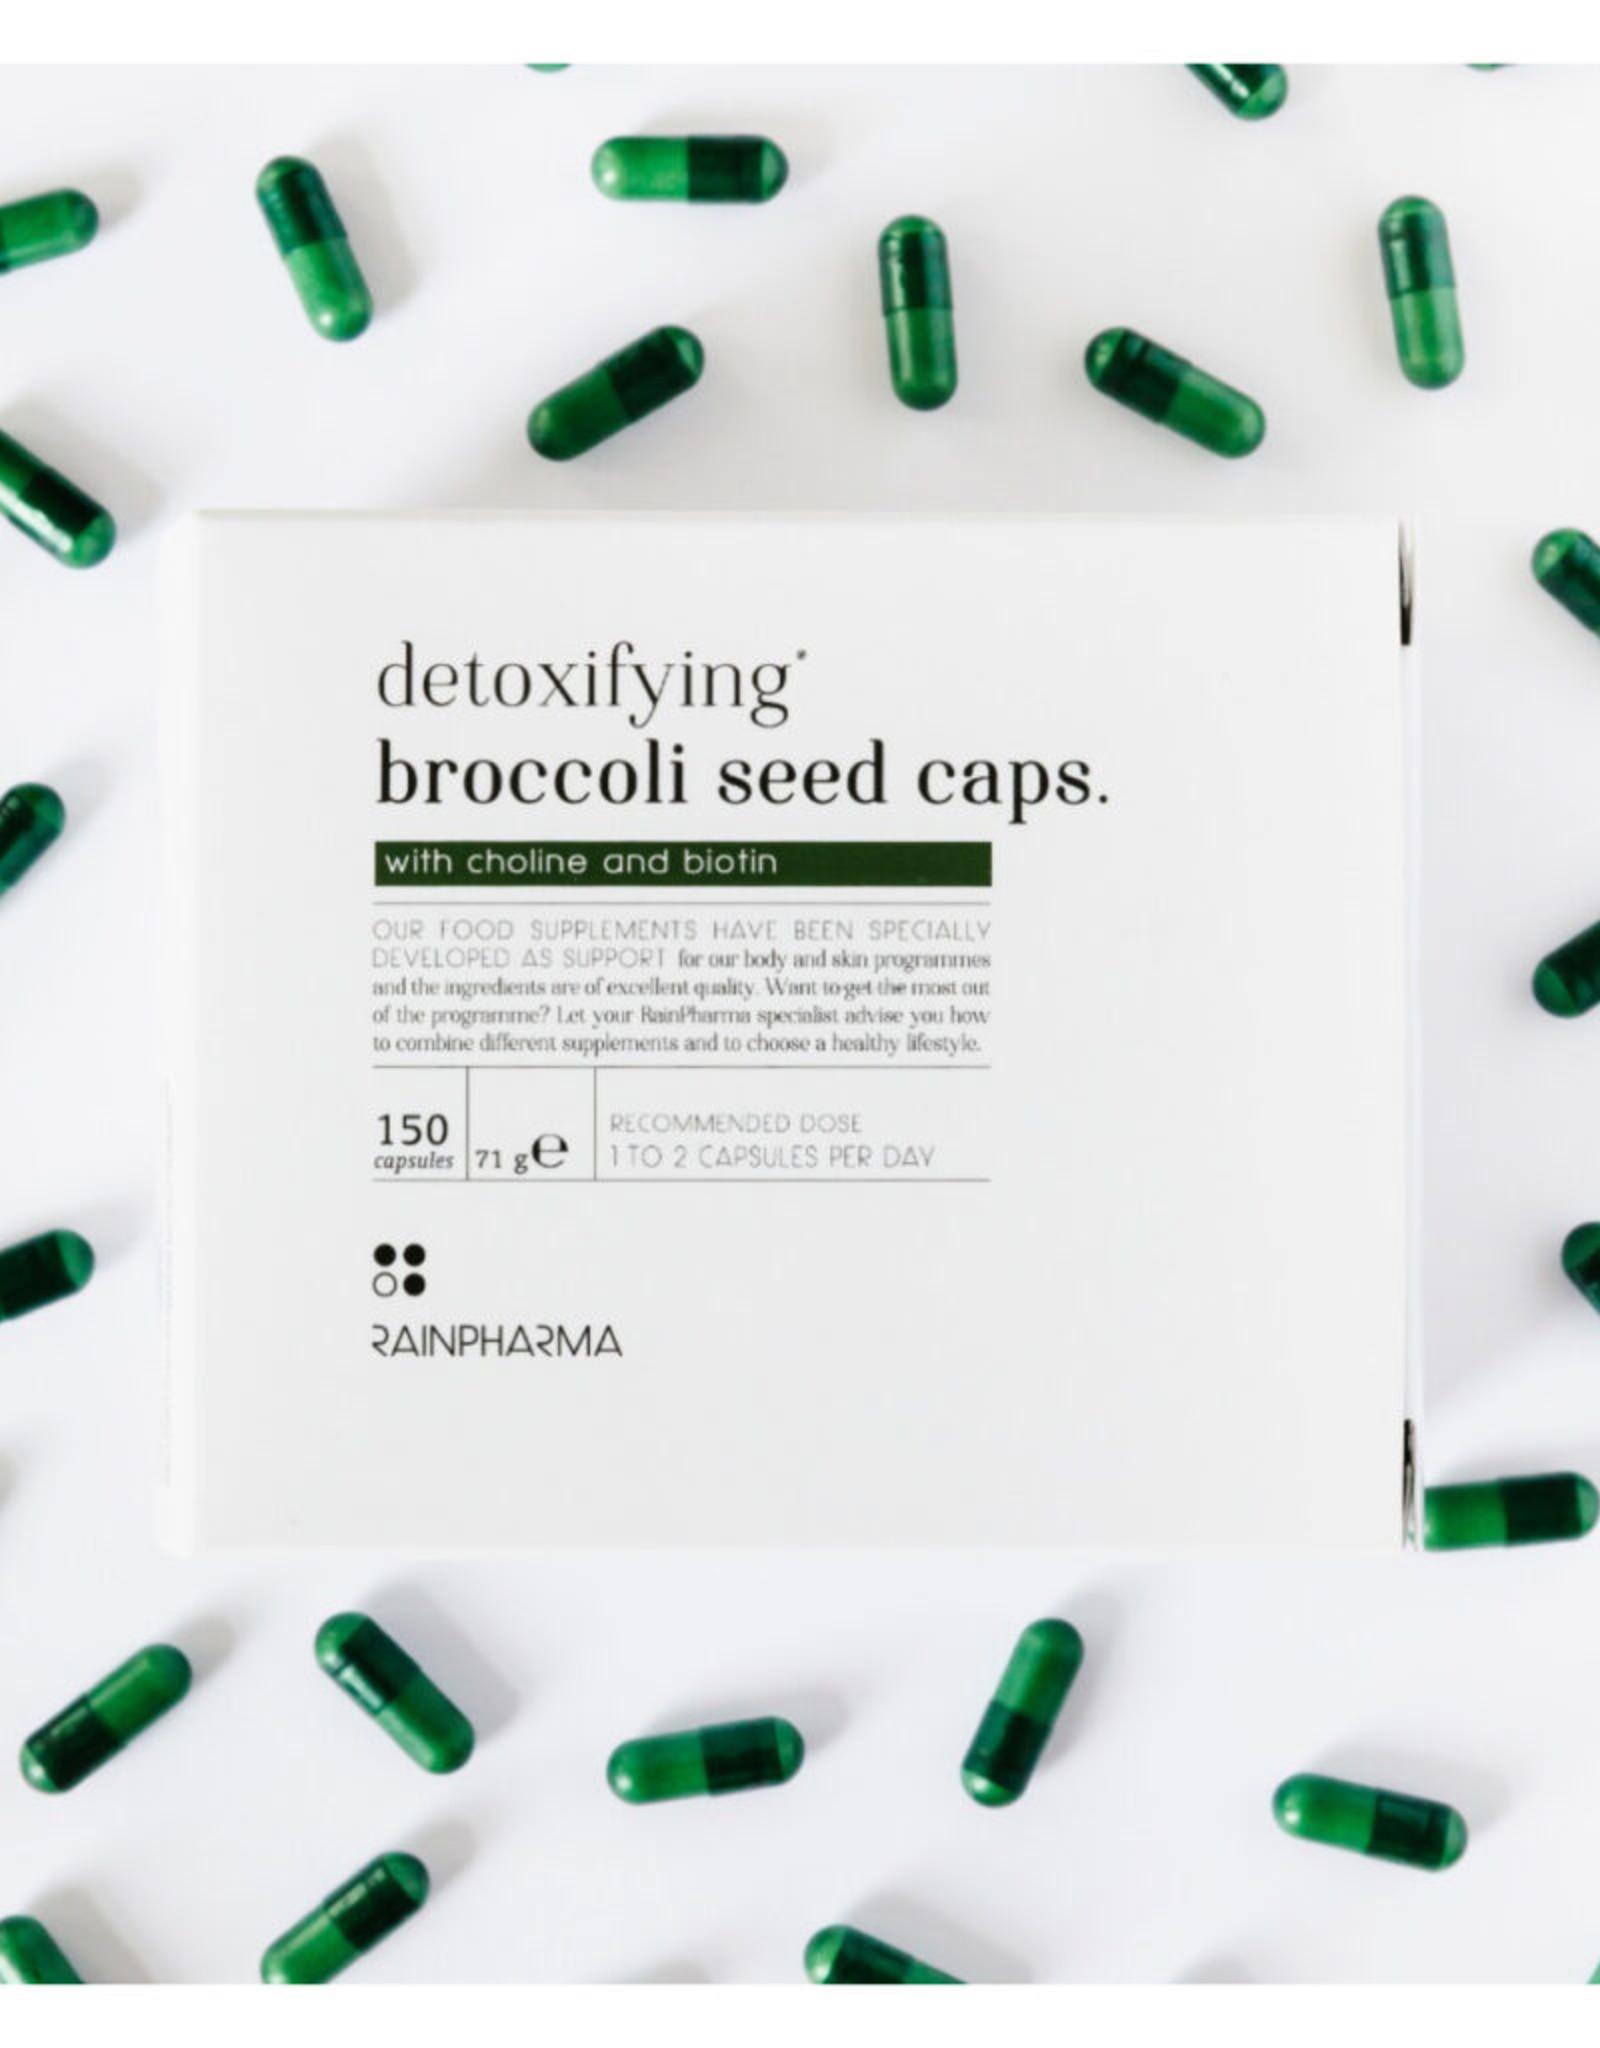 RainPharma Detoxifying Broccoli Seed Caps 150 caps – Rainpharma